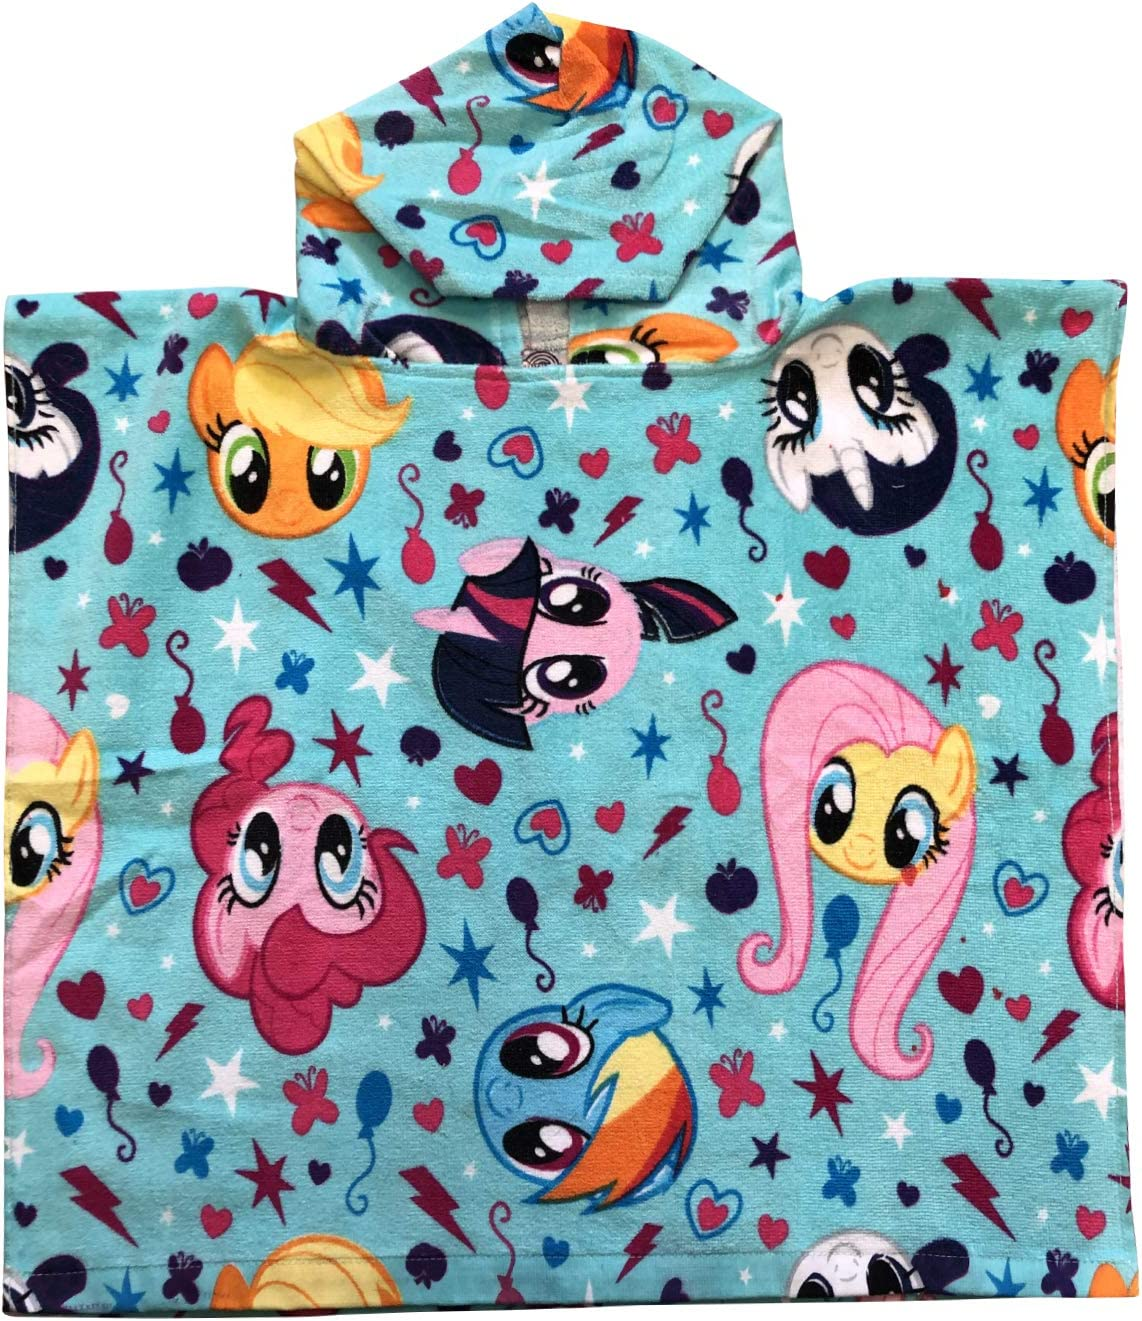 My Little Pony Twilight Sparkle, Applejack, Pinkie Pie, Rainbow Dash, Fluttershy & Rarity Blue Hooded Poncho Towel